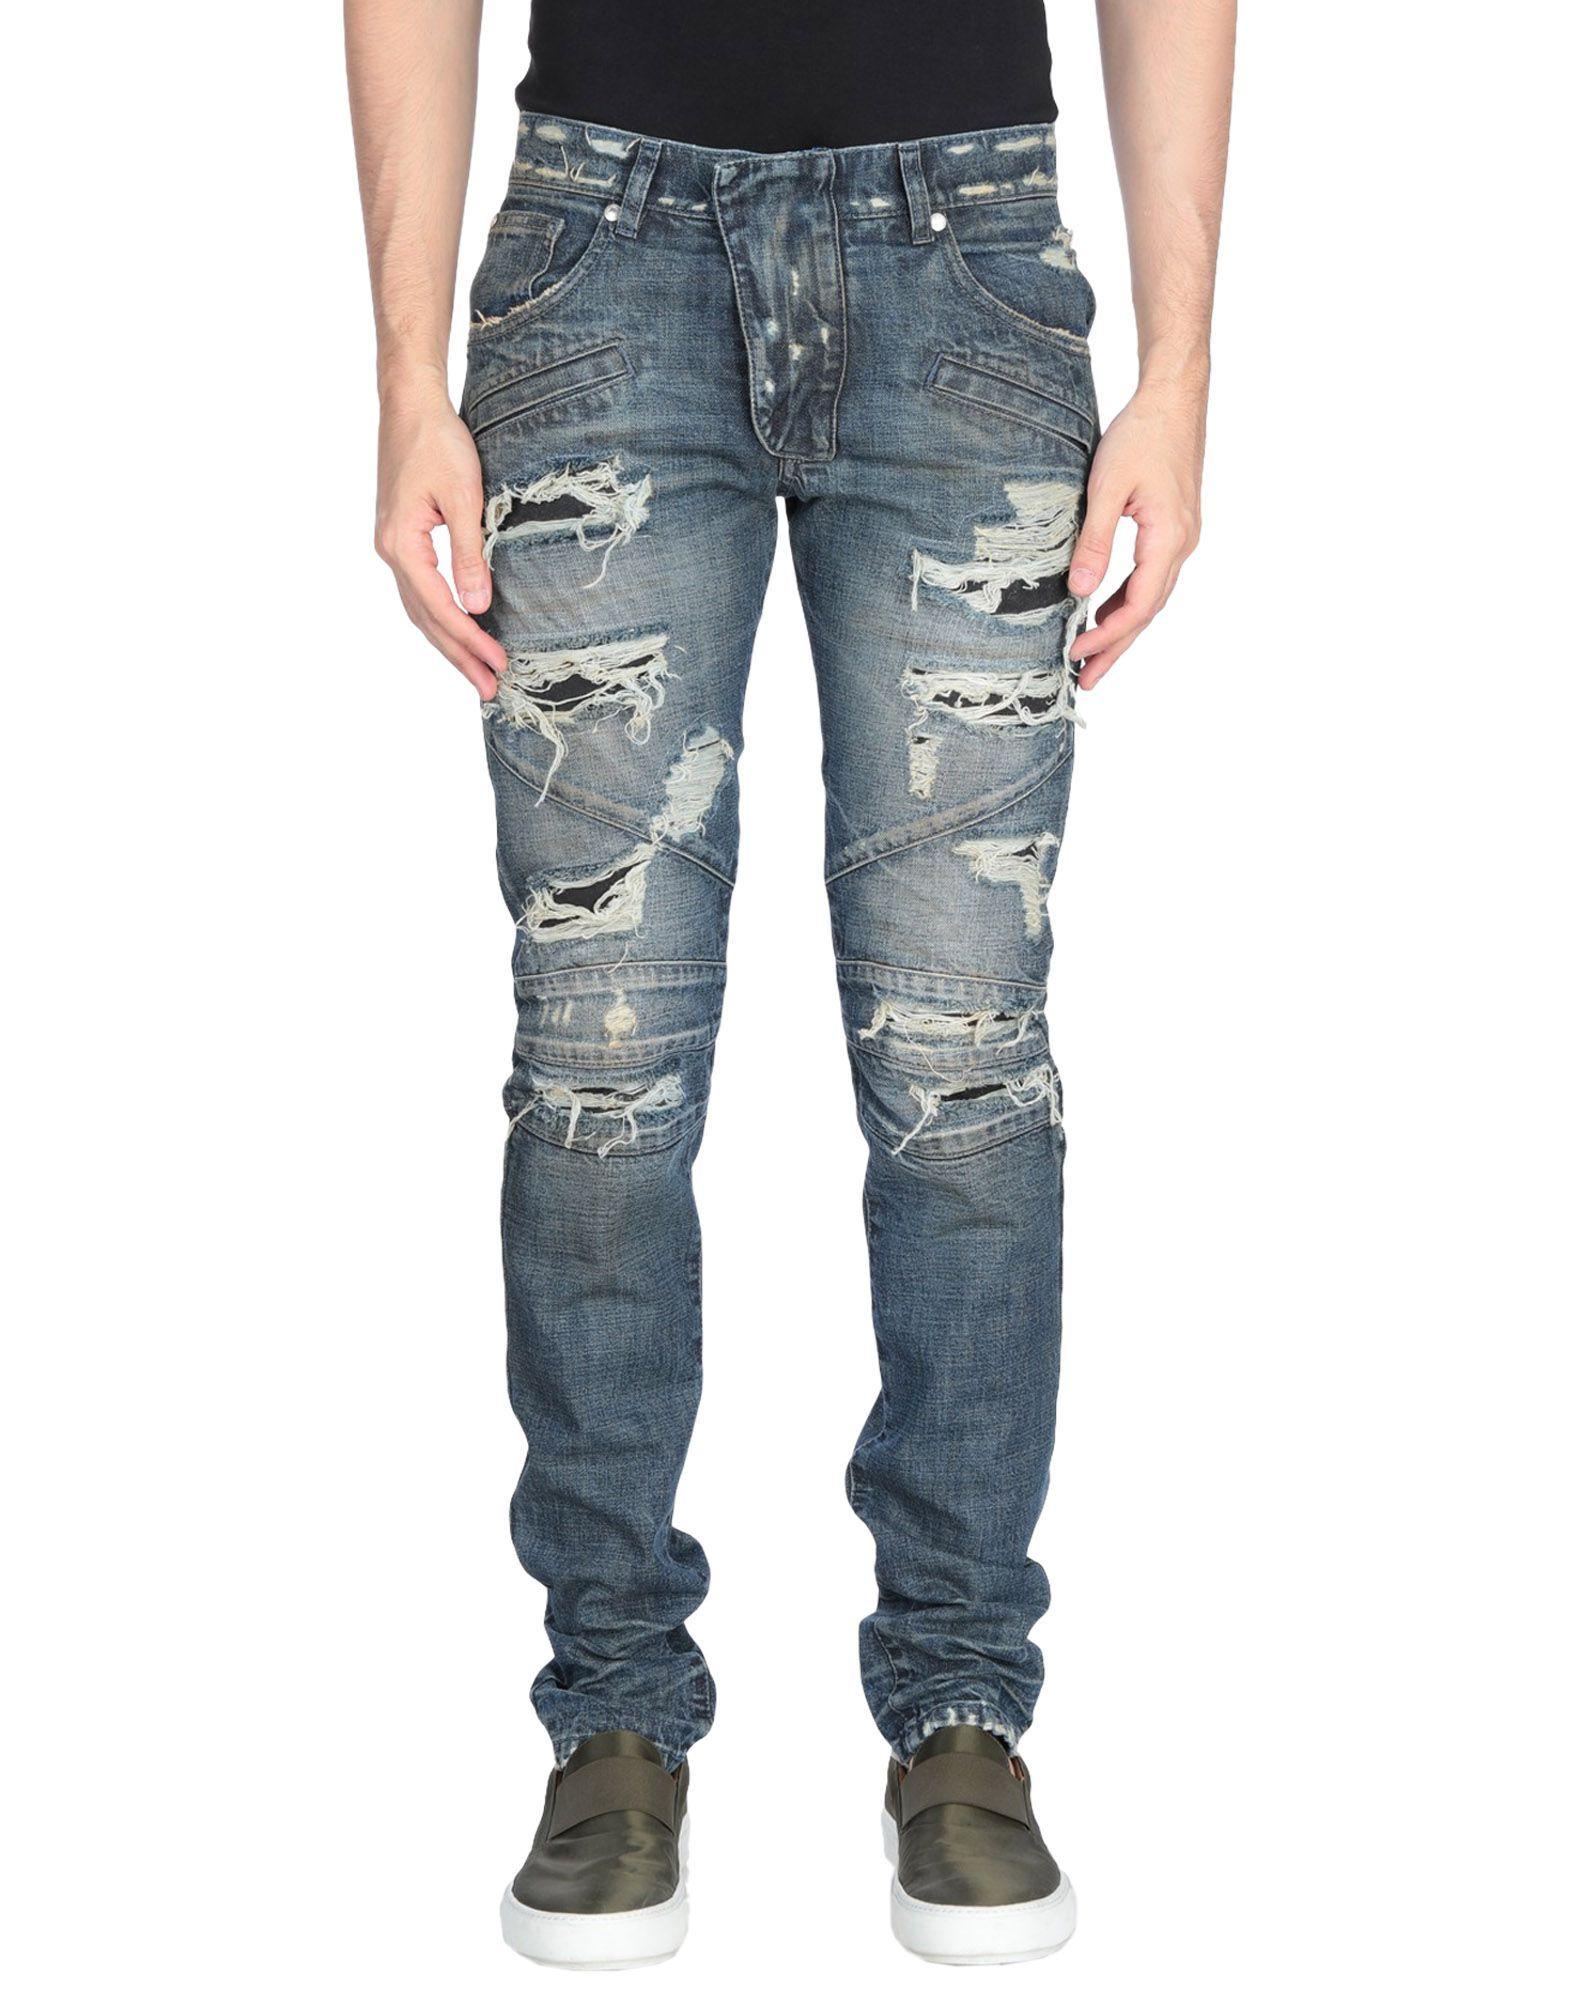 Pierre Balmain Blue Cotton Worn Effect Jeans